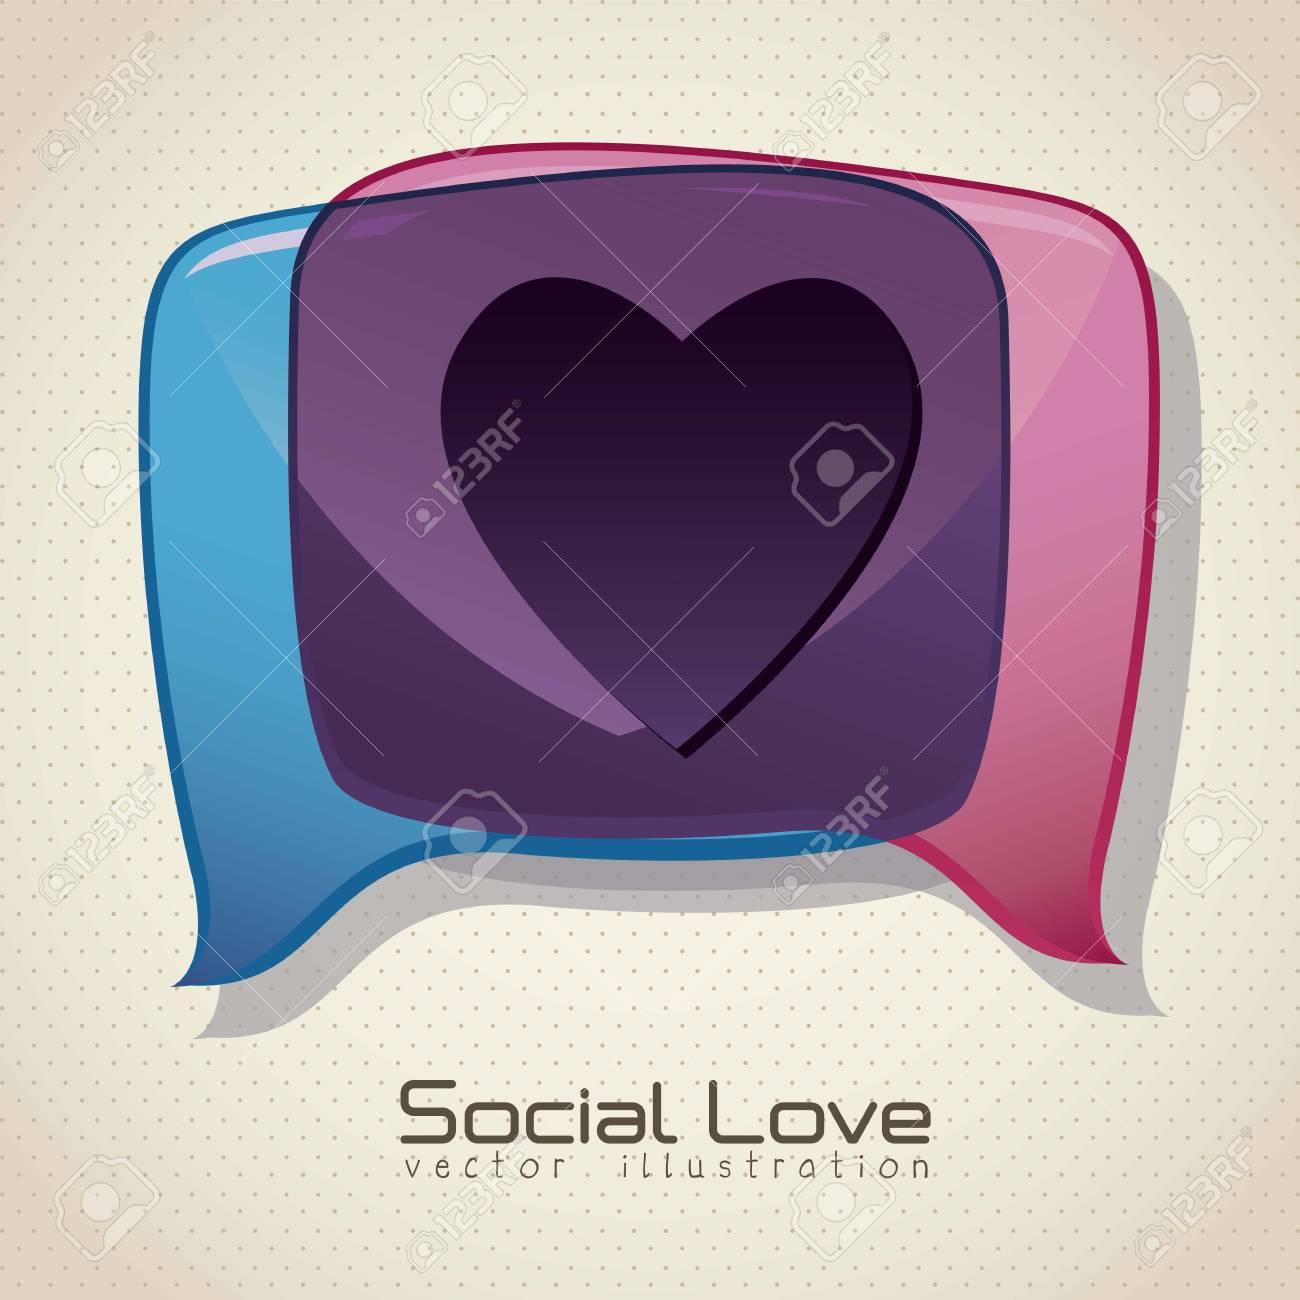 Illustration of balloons, love social networking, vector illustration Stock Vector - 16184581